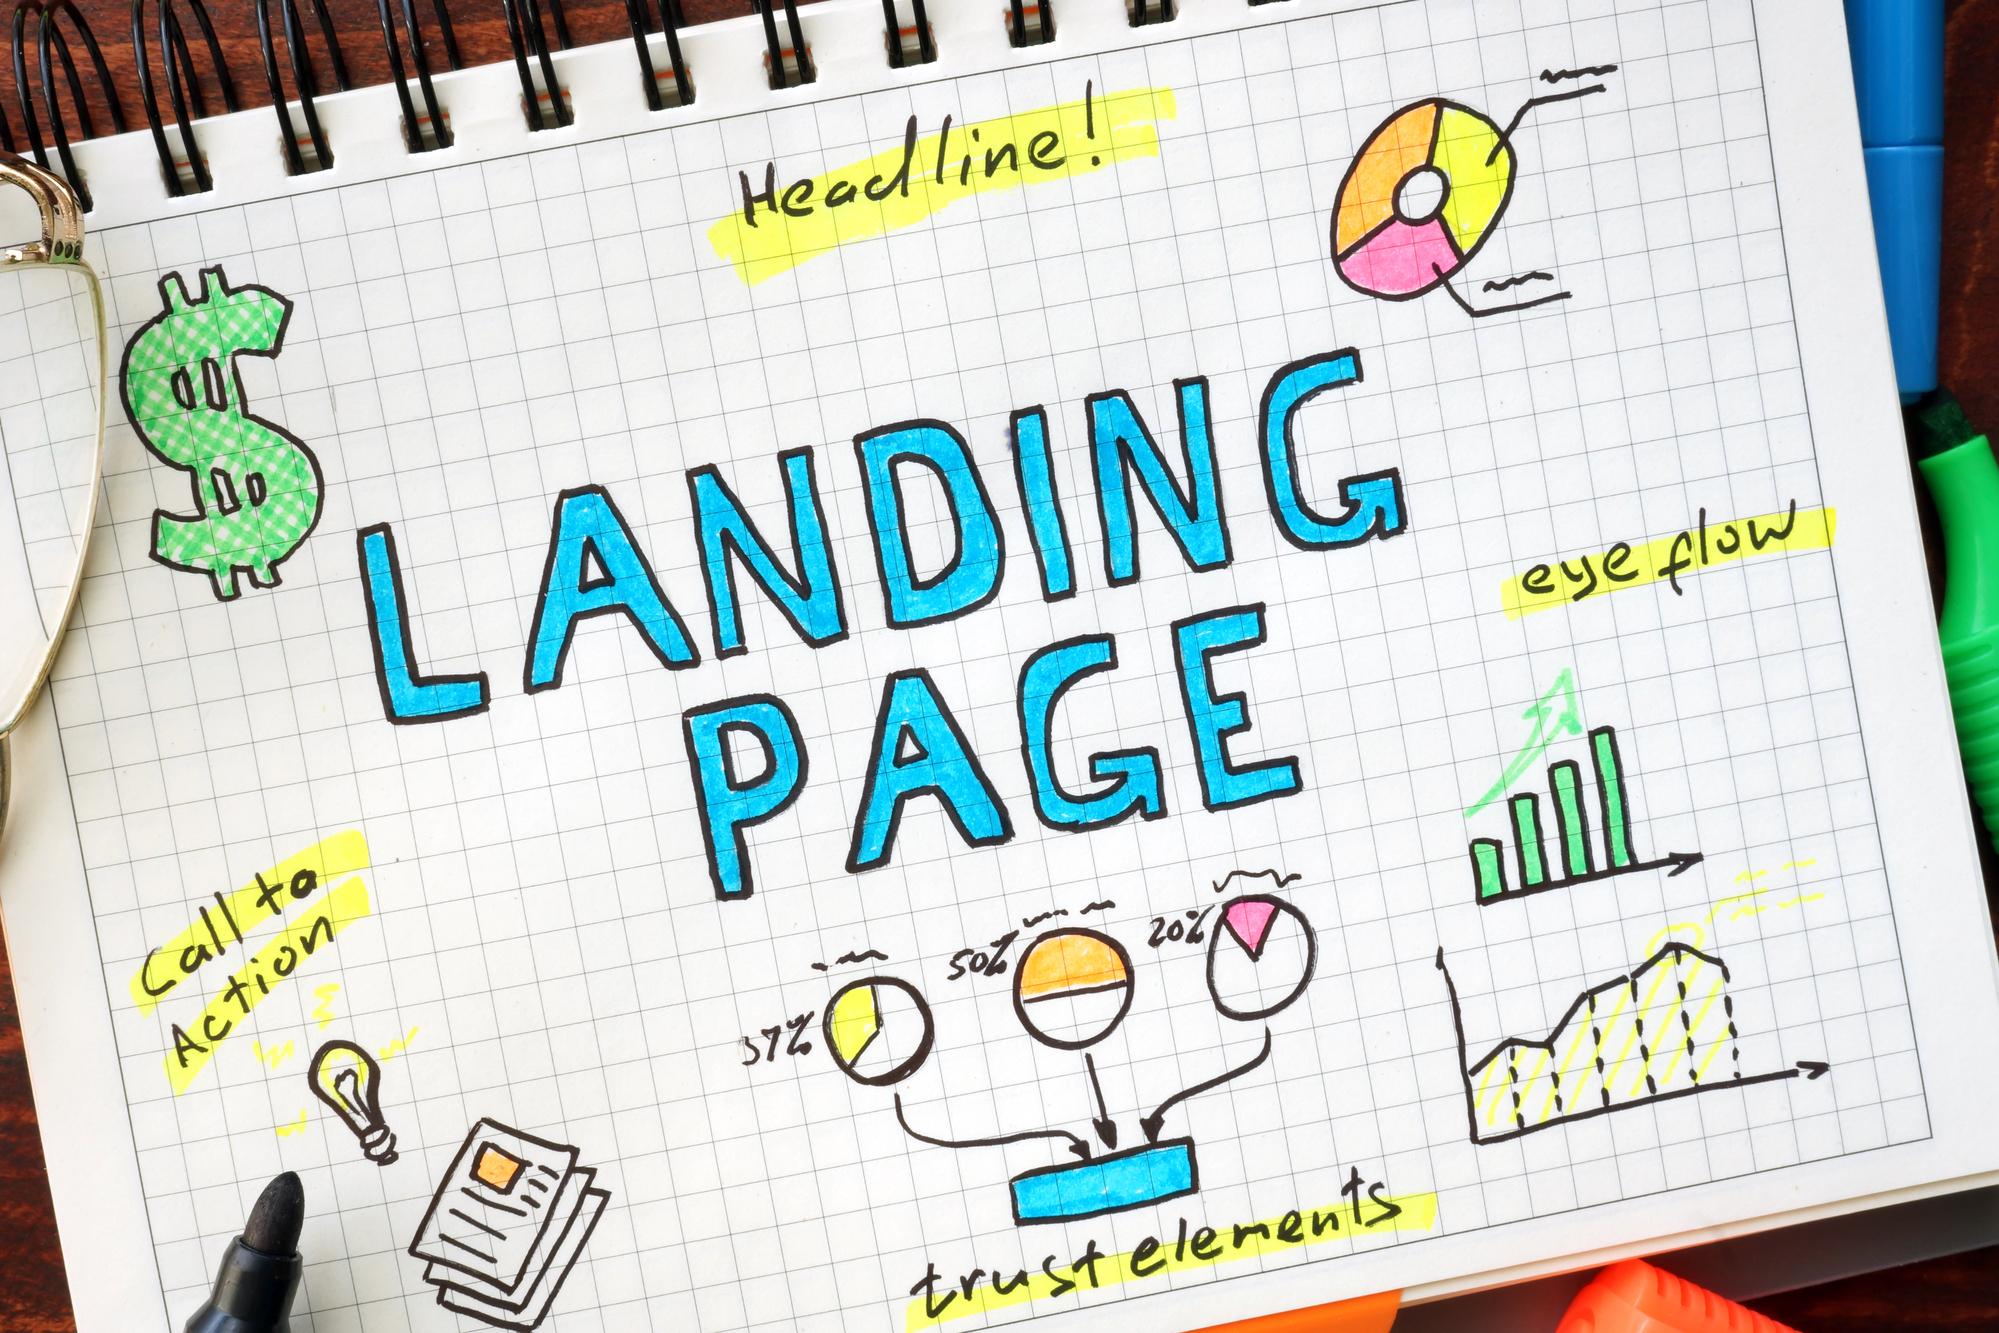 Cechy dobrego landingpage